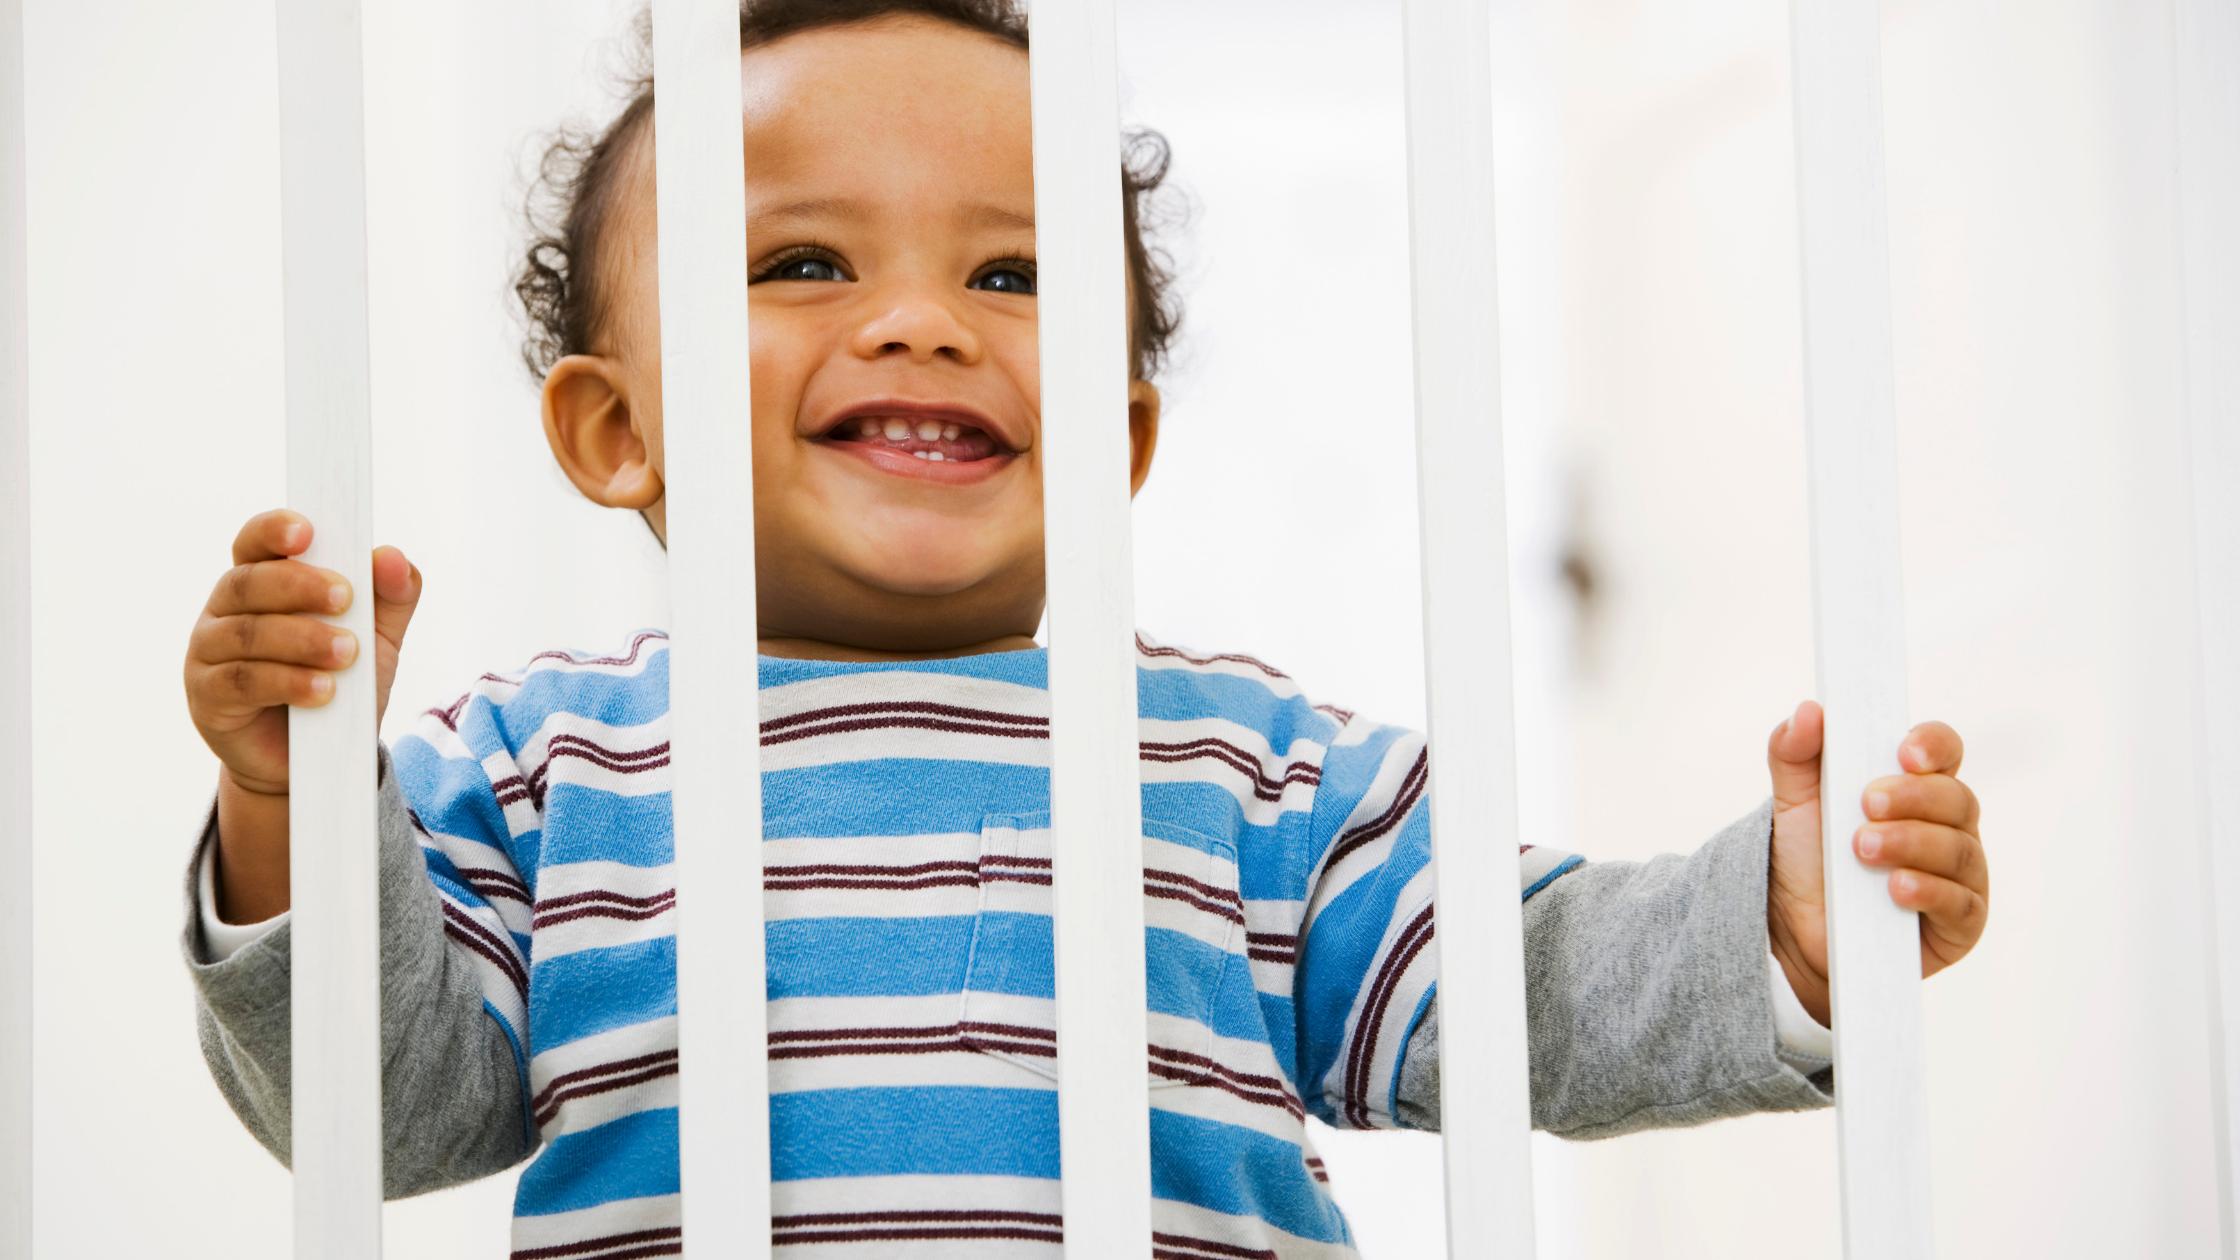 baby behind a gate